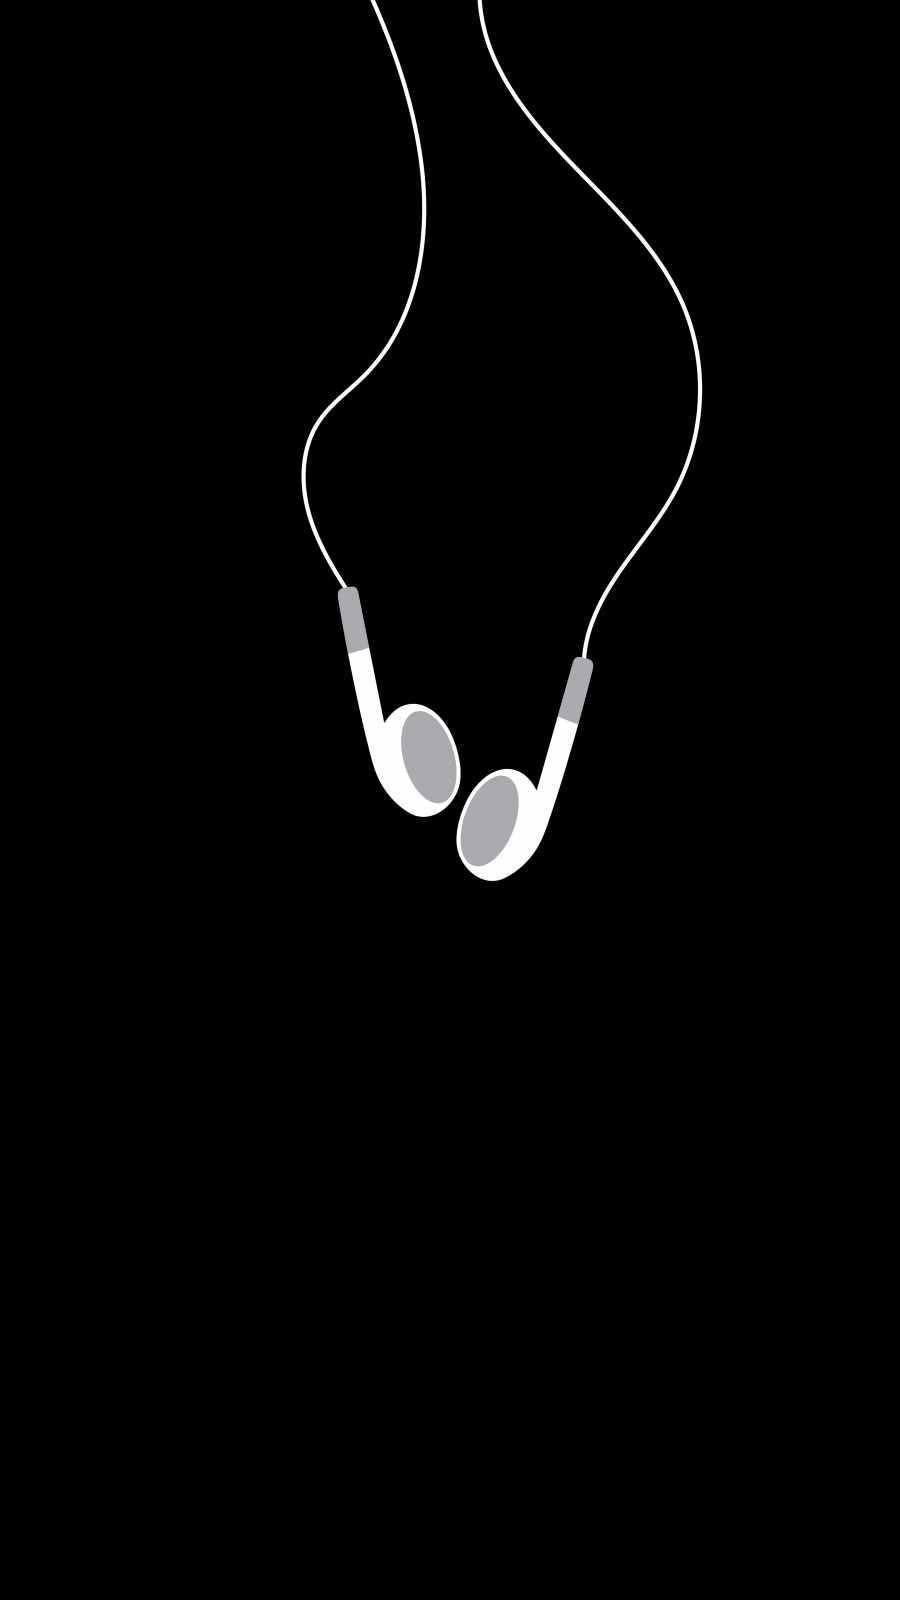 Apple Headphones